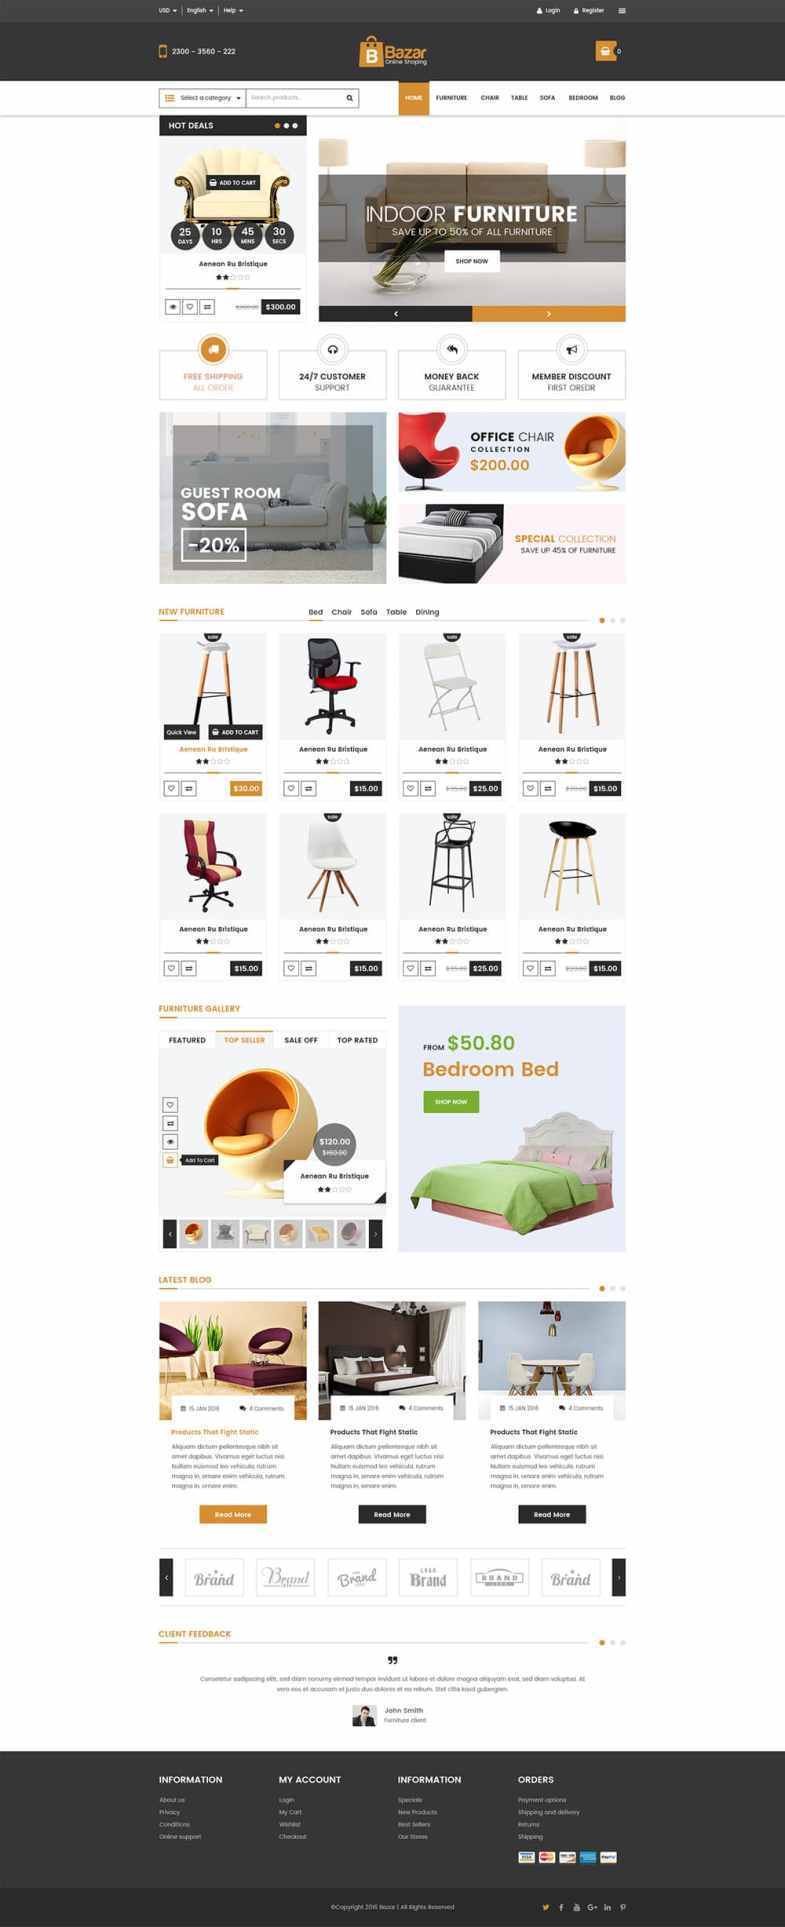 Bazar E Commerce Web Template PSD Бесплатные шаблоны для интернет-магазина psd - Bazar E Commerce Web Template PSD - Бесплатные шаблоны для интернет-магазина PSD